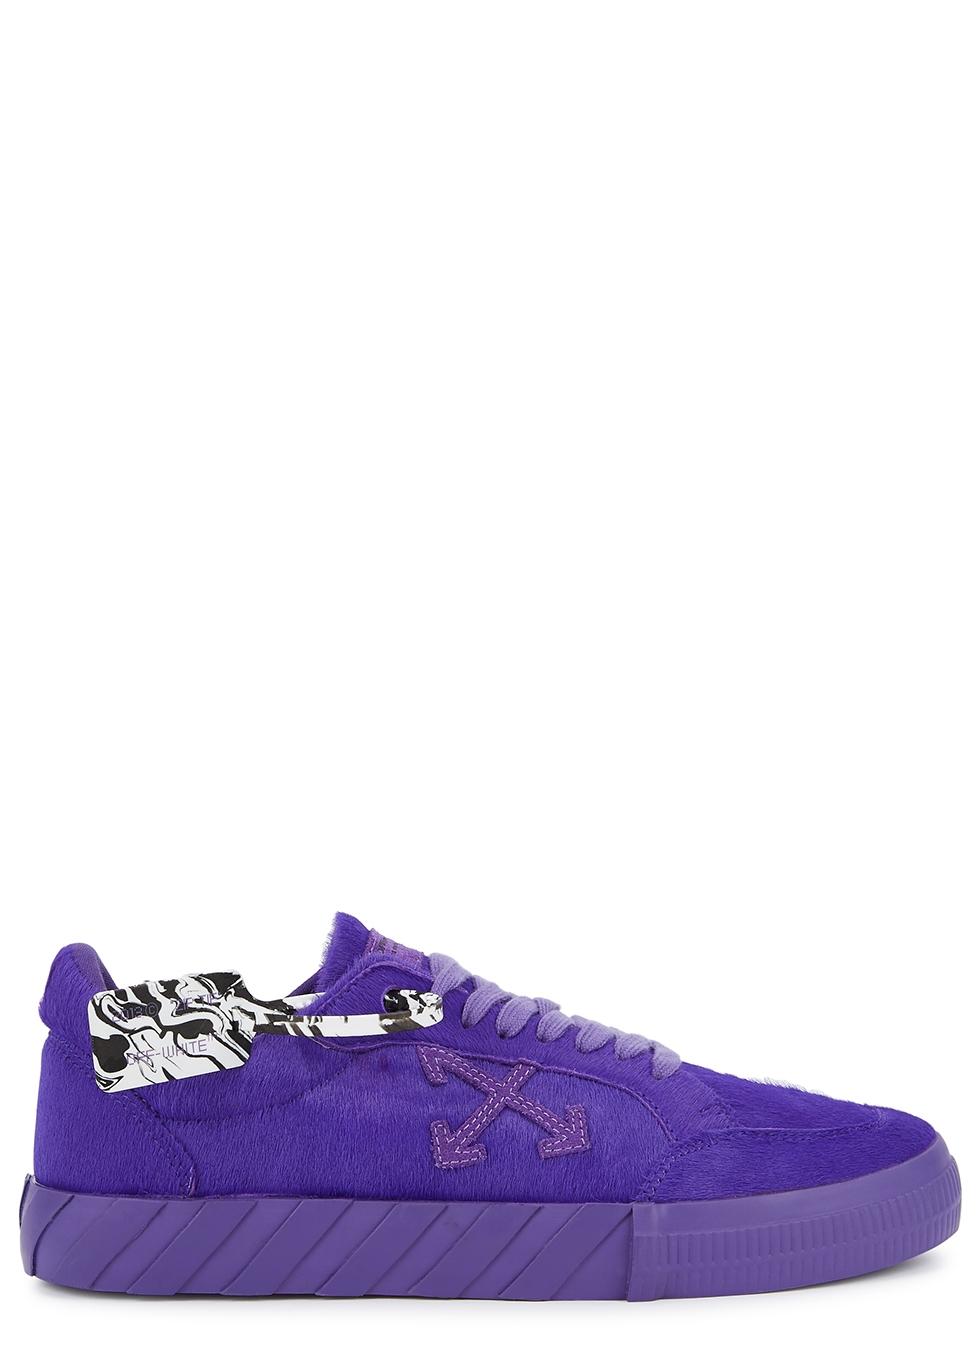 Off-White Low Vulcanized purple calf